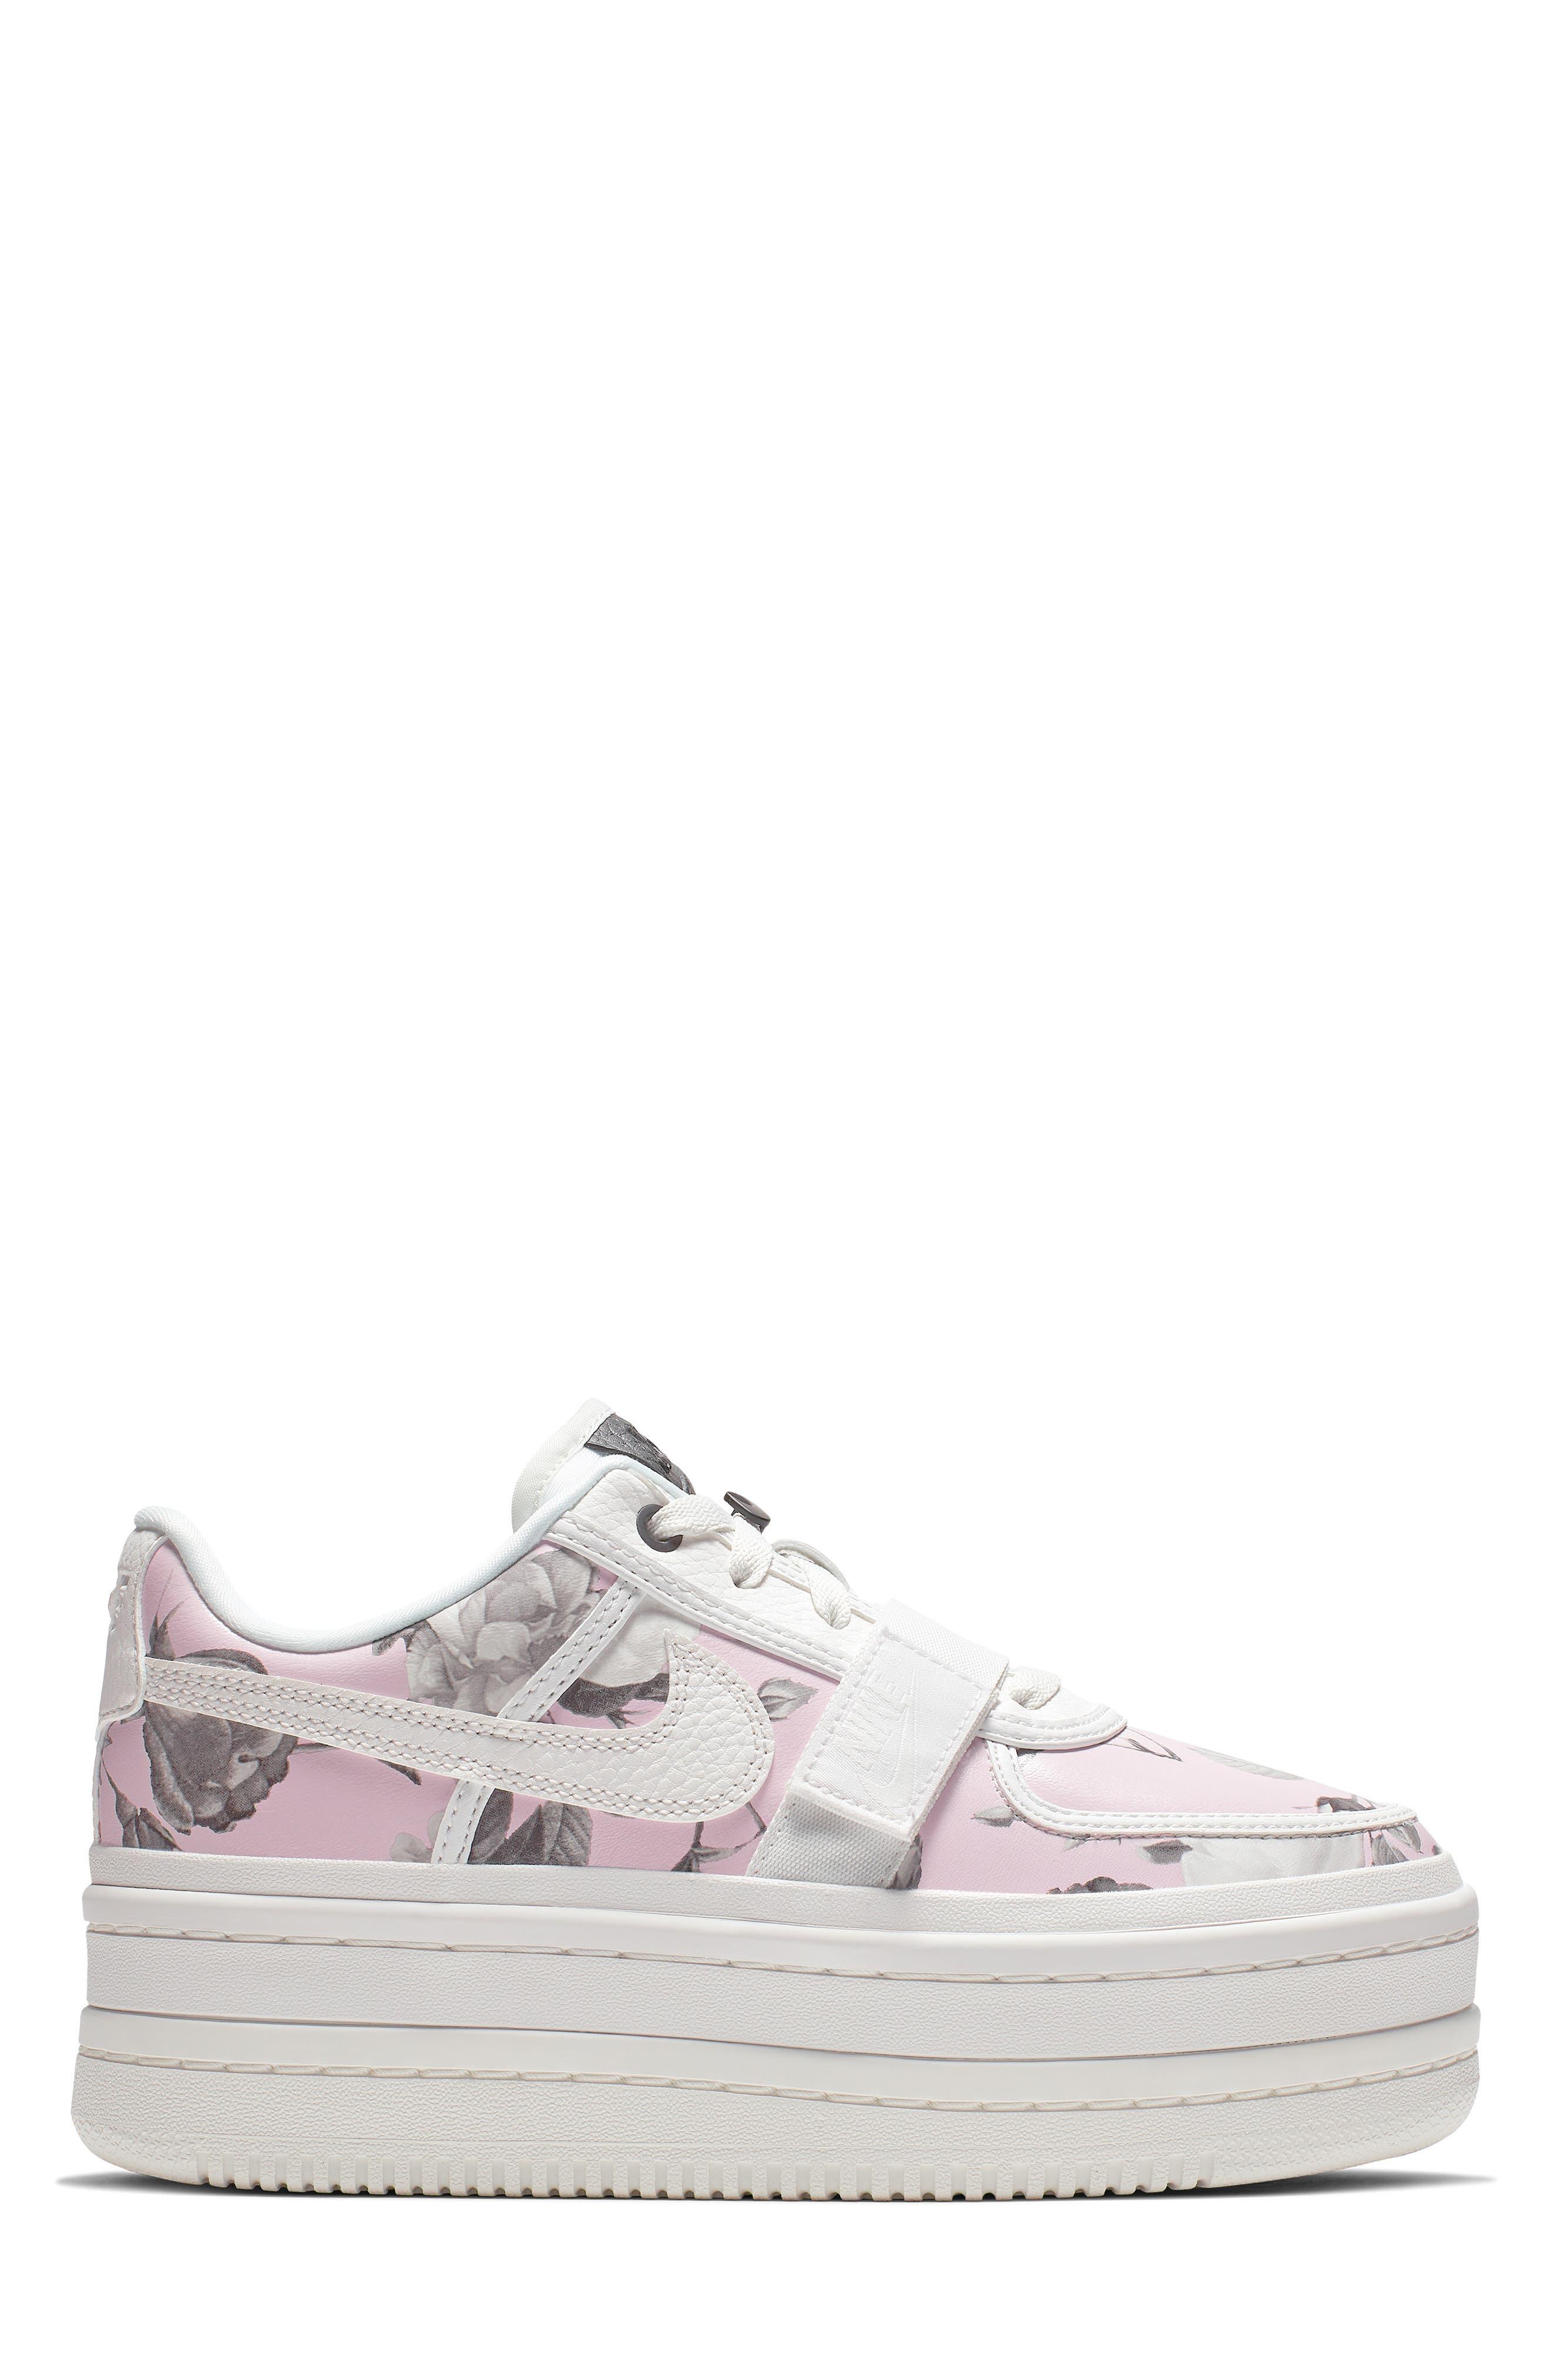 NIKE,                             Vandal 2K LX Platform Sneaker,                             Alternate thumbnail 3, color,                             WHITE/ WHITE/ BLACK